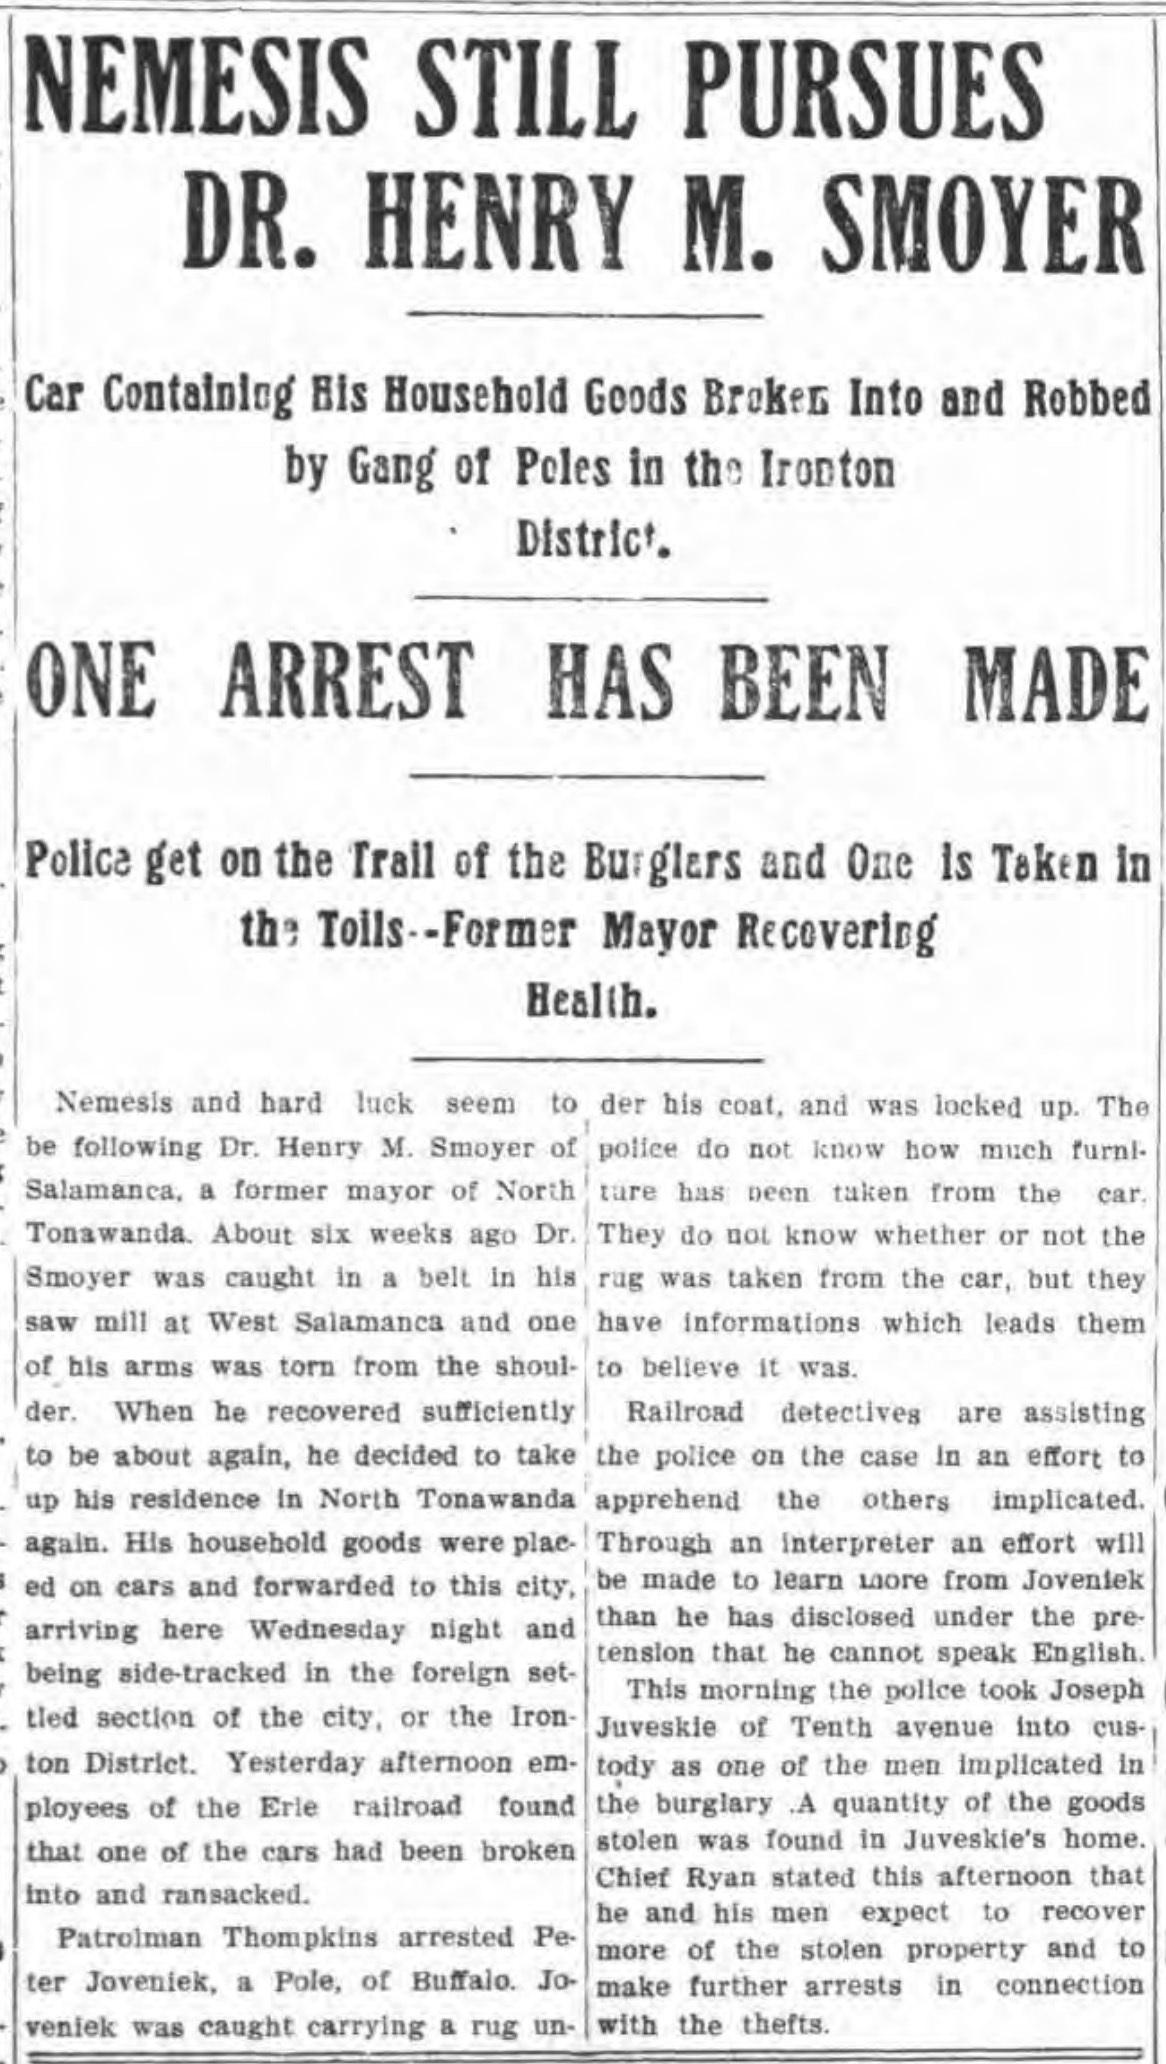 Nemesis Still Pursues Smoyer, Ironton Poles, article (Tonawanda News, 1901-11-01).jpg